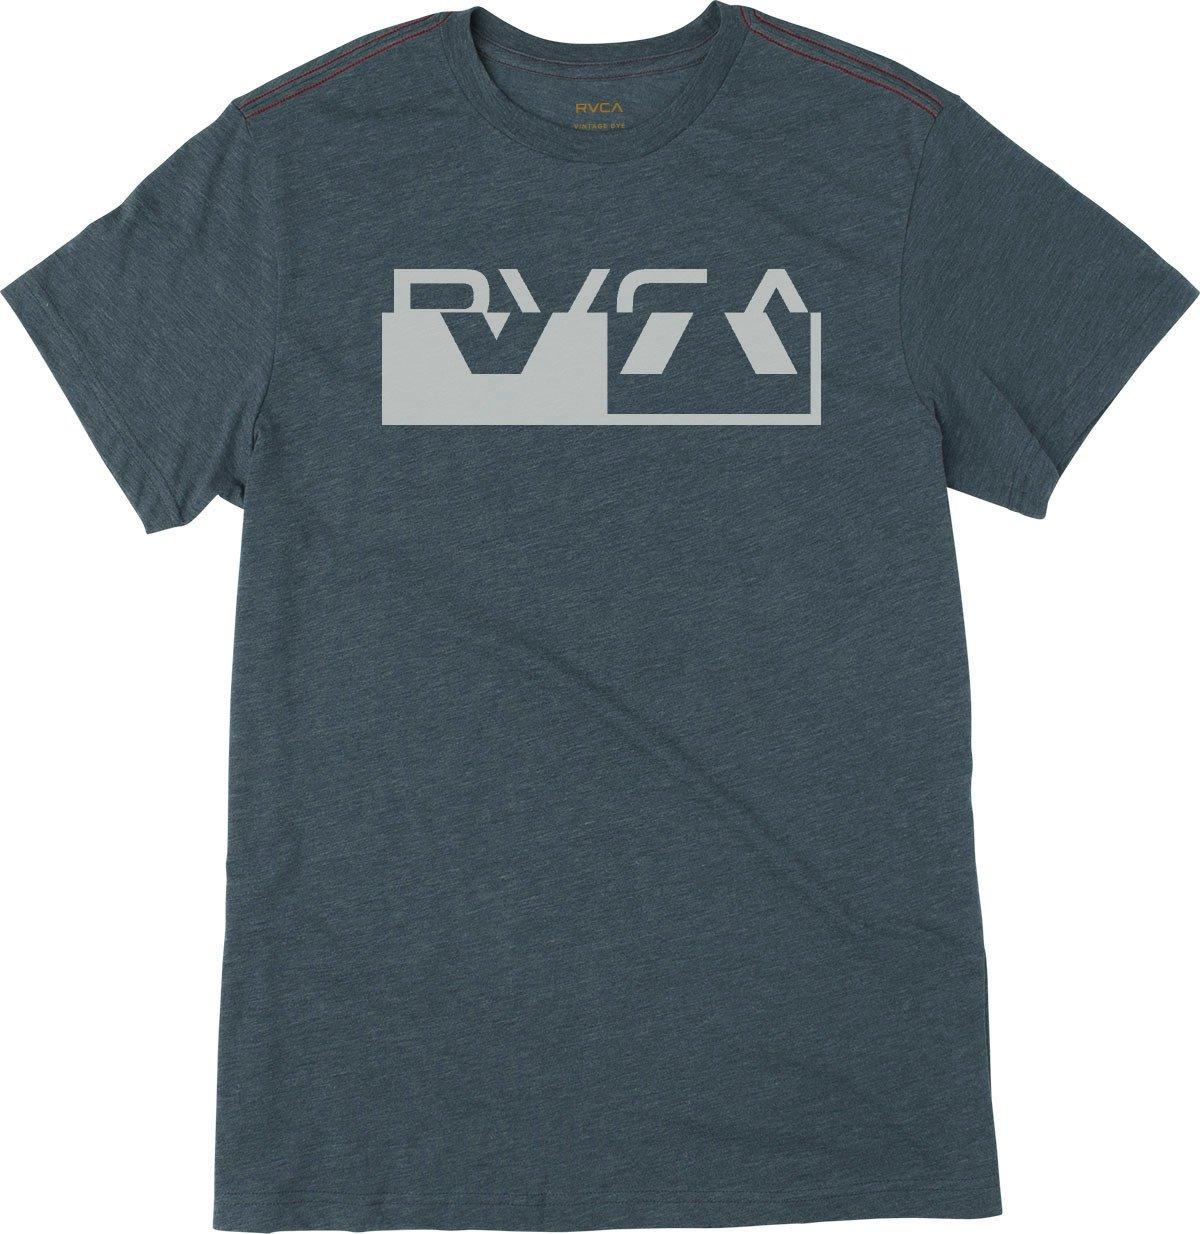 RVCA Men's Co Brand Short Sleeve T-Shirt, Dark Denim, M